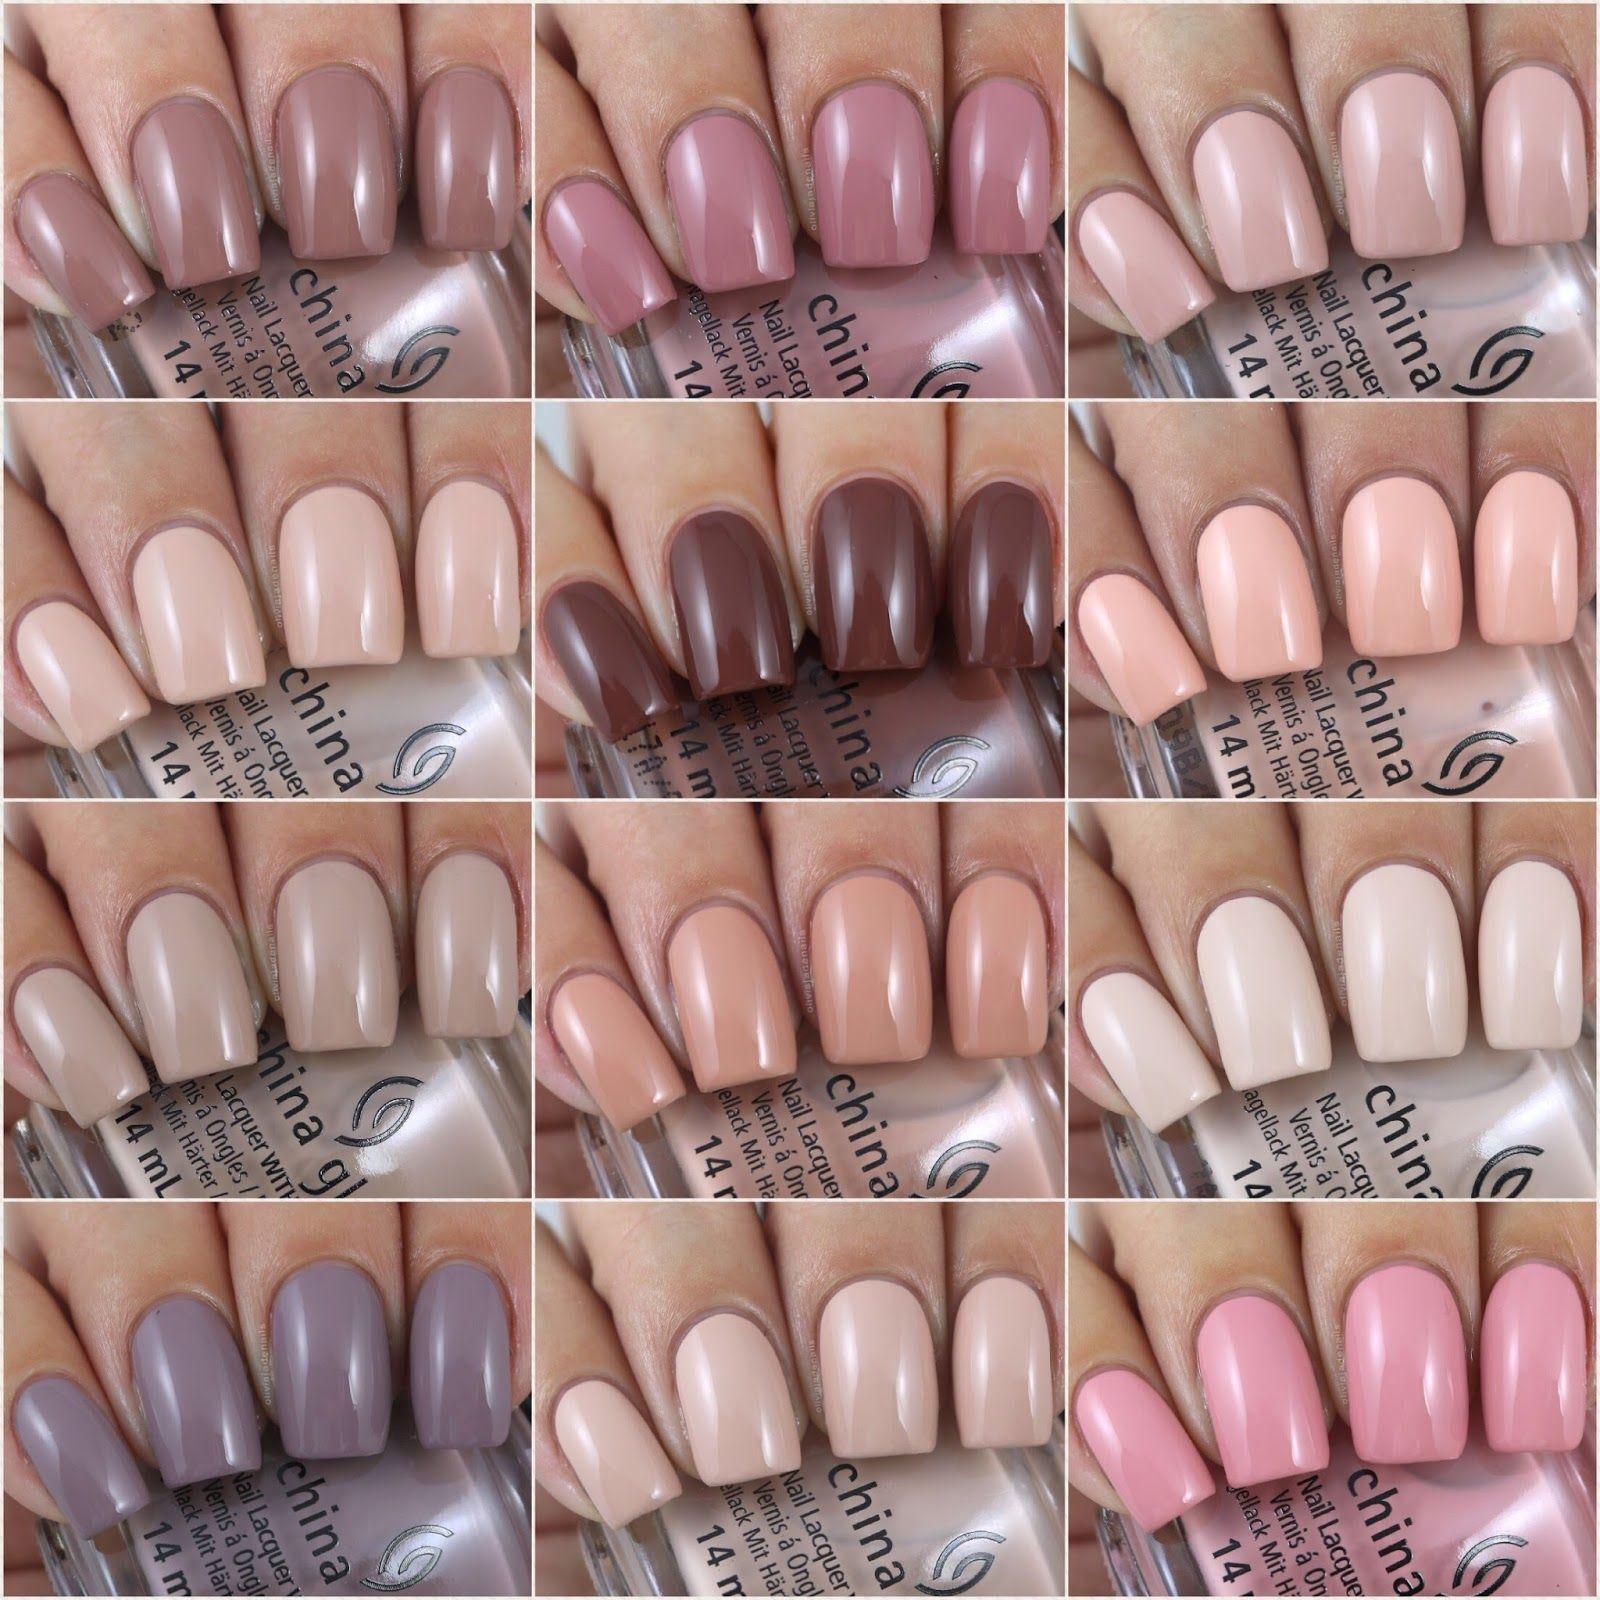 Spray on nail polish china glaze nail spray reviews - China Glaze Shades Of Nude Collection Swatches Review By Olivia Jade Nails